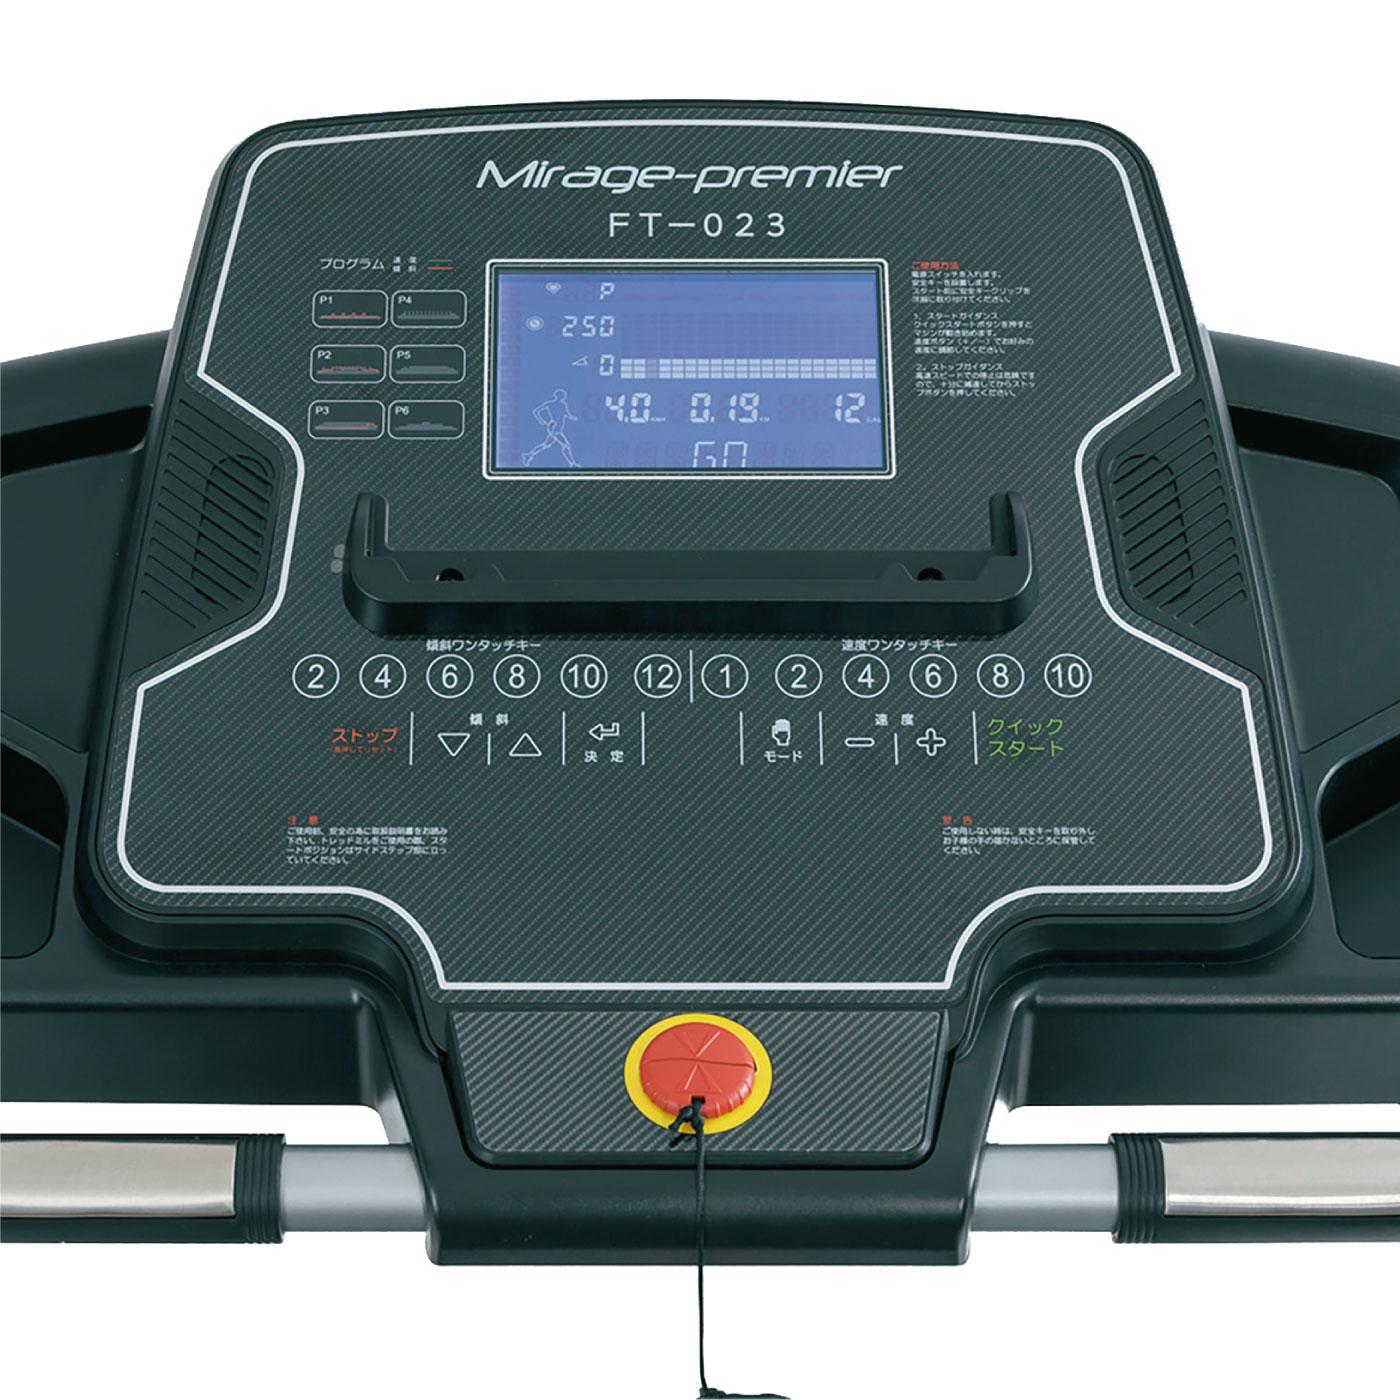 FT-023/家庭用ランニングマシン《フジモリ》